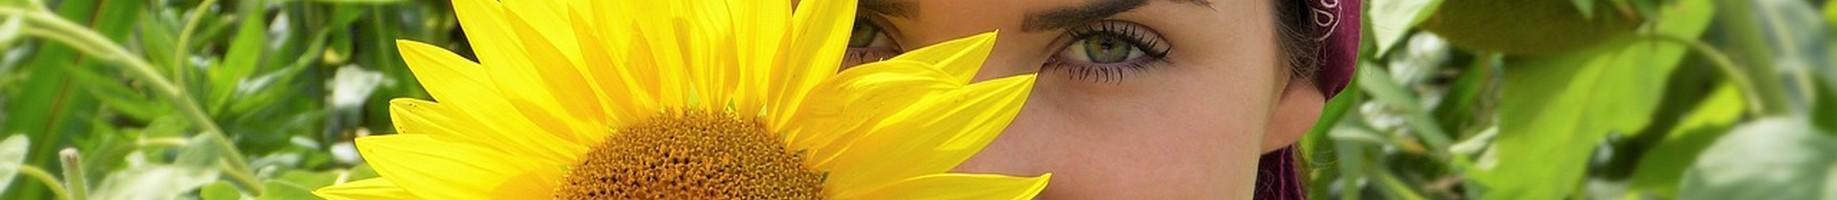 sun-flower-2699771_1280